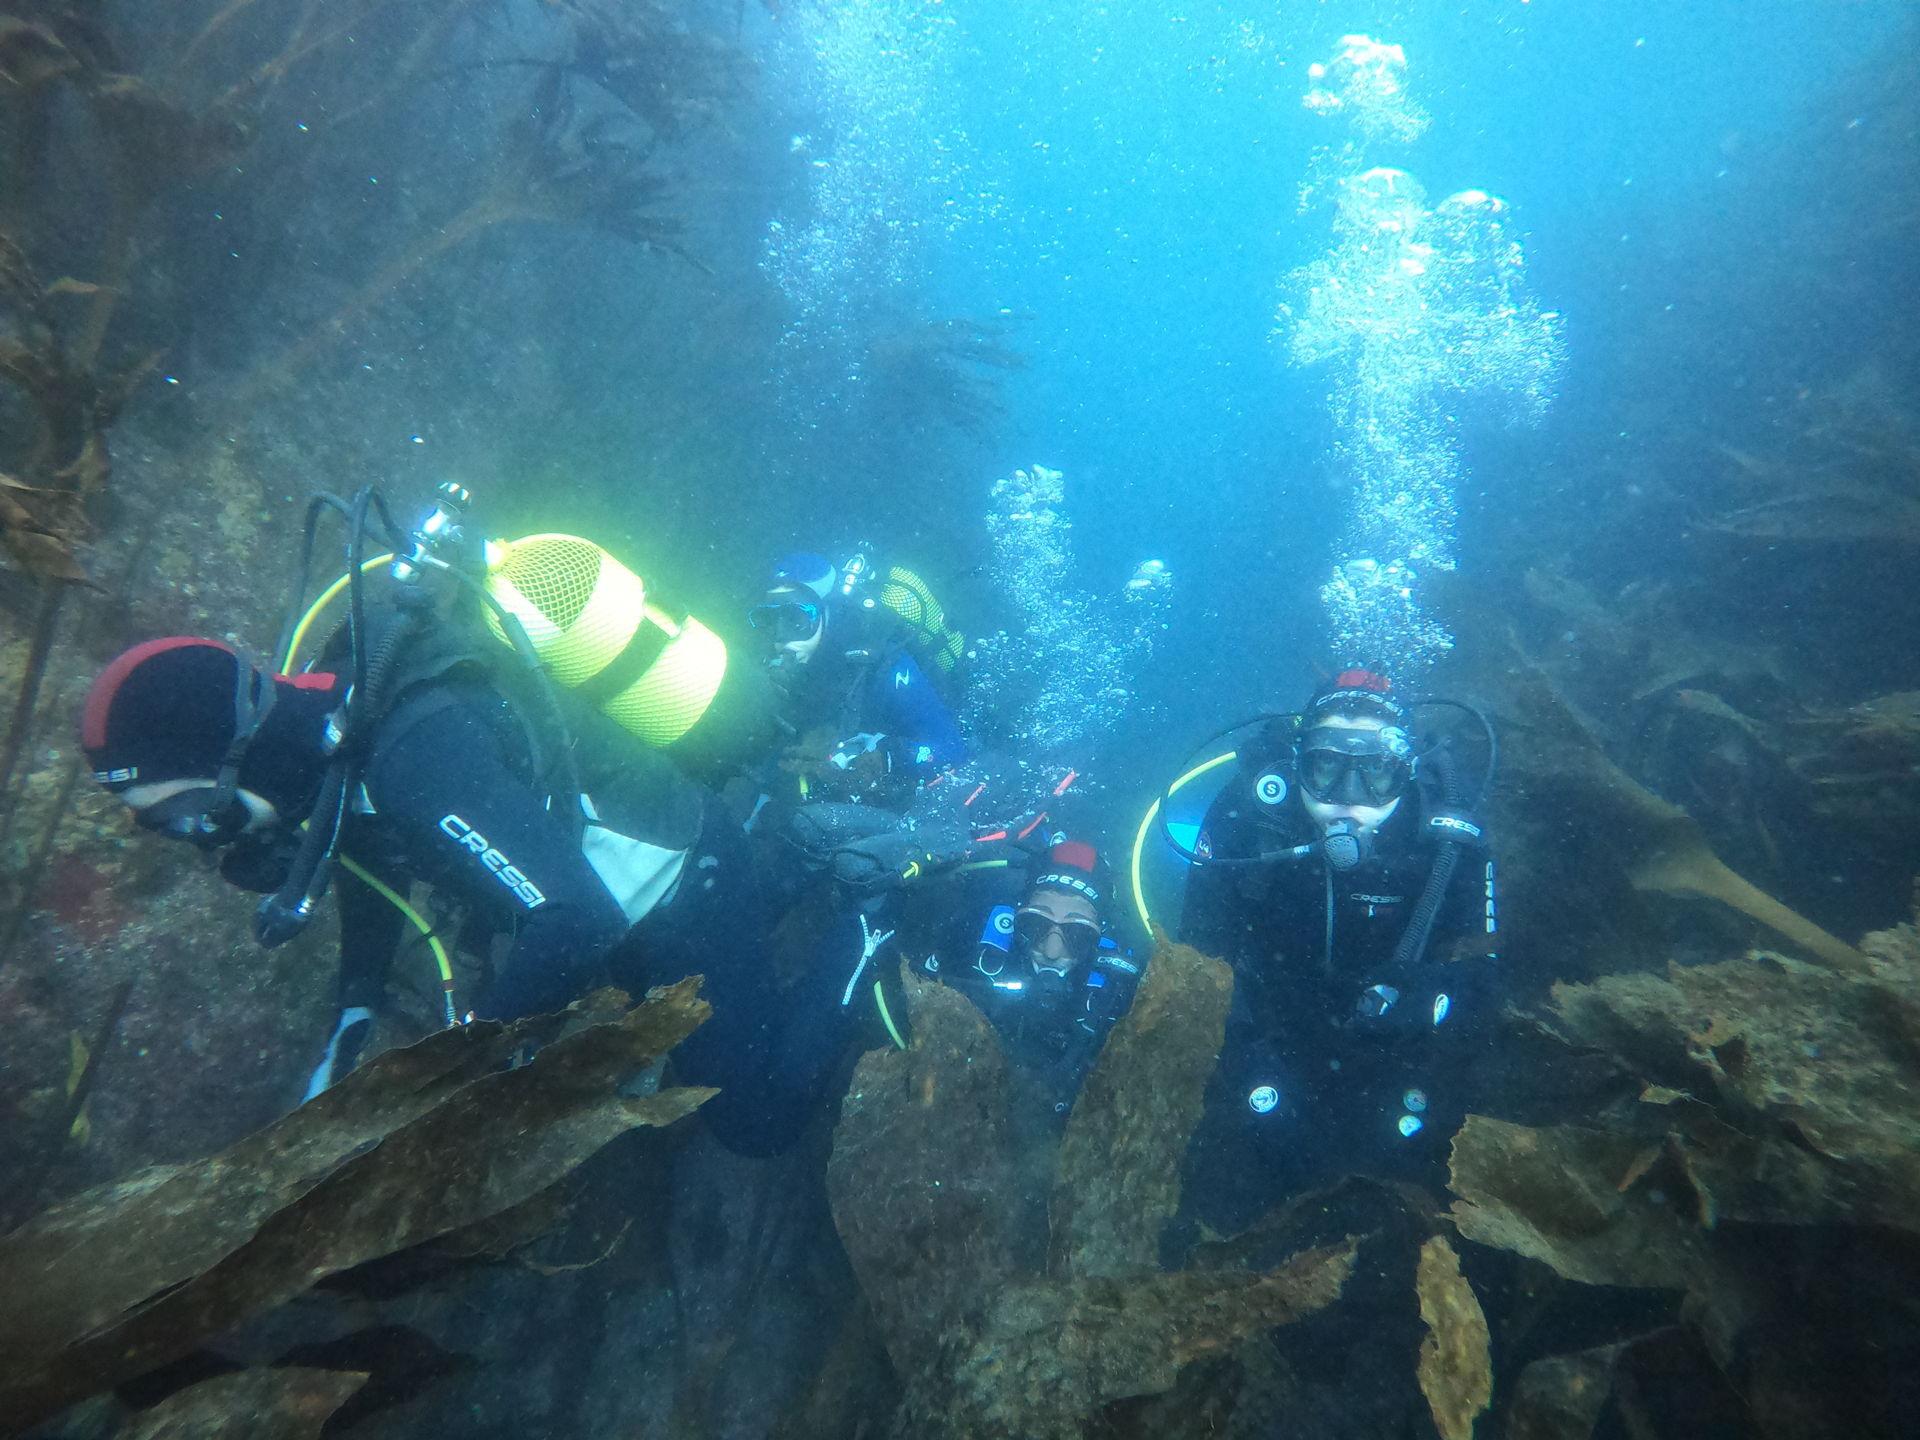 Iniciación - PADI Open Water Diver (OWD)